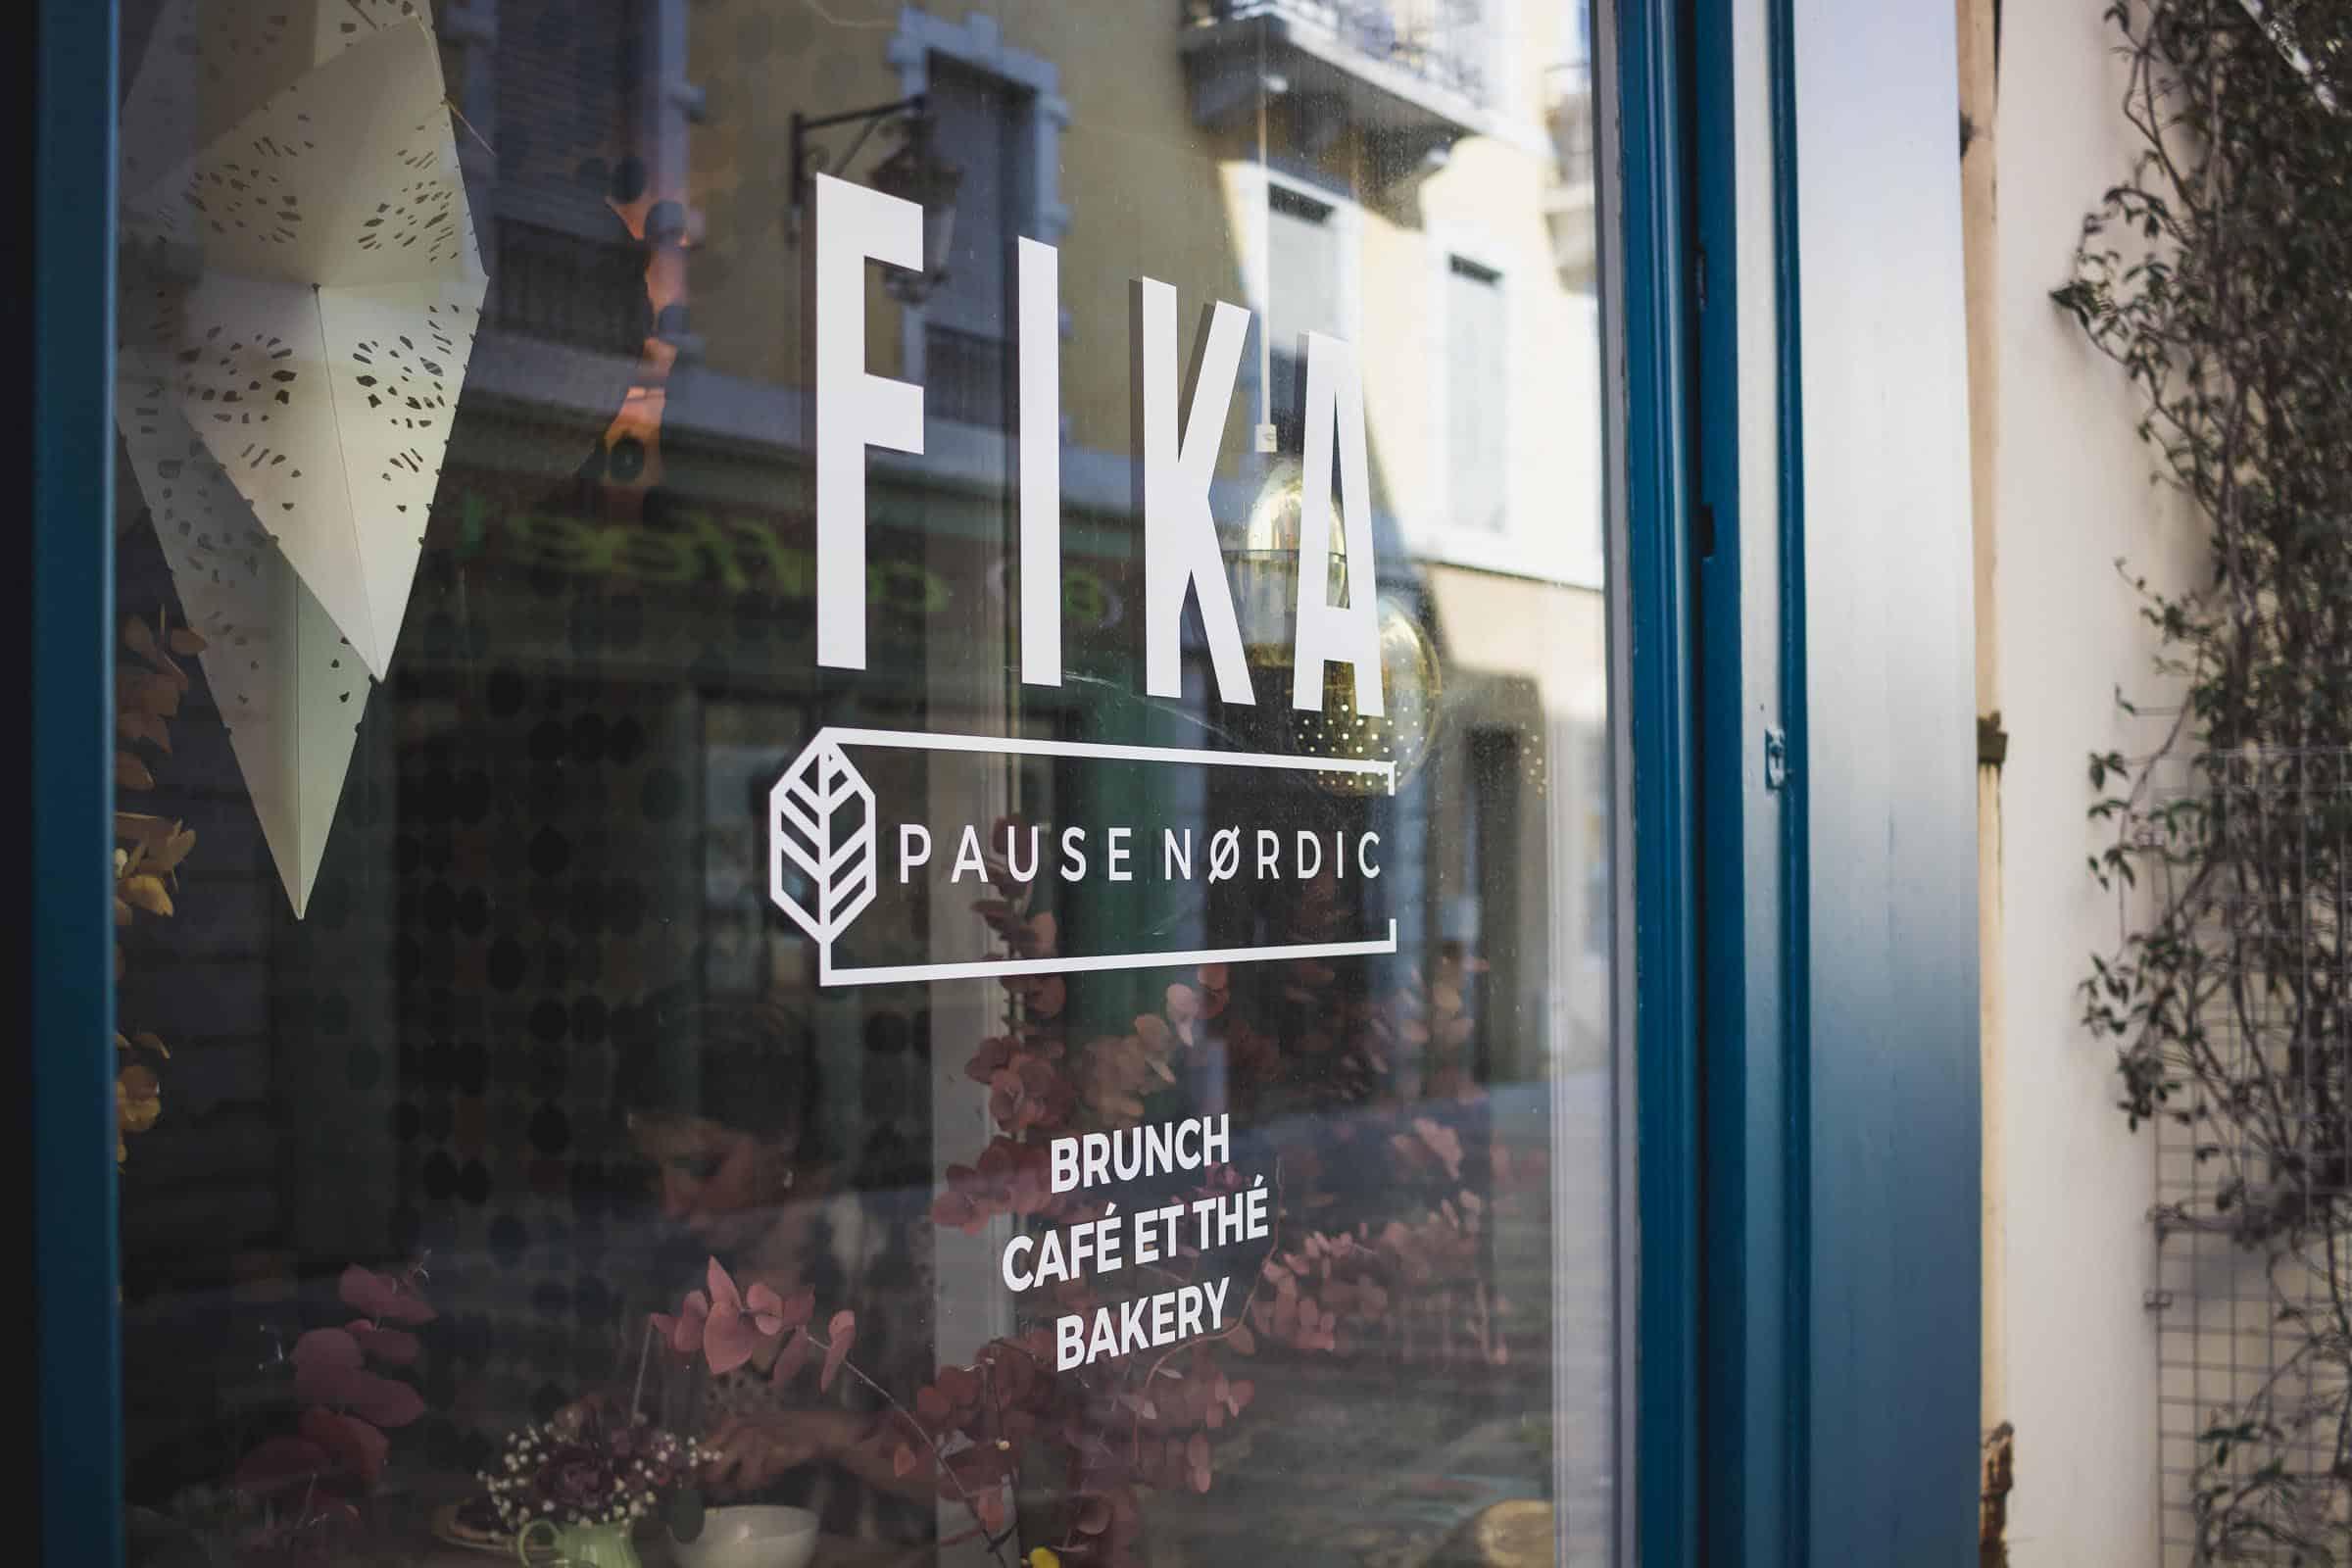 Fika Pause Nordic à Pau